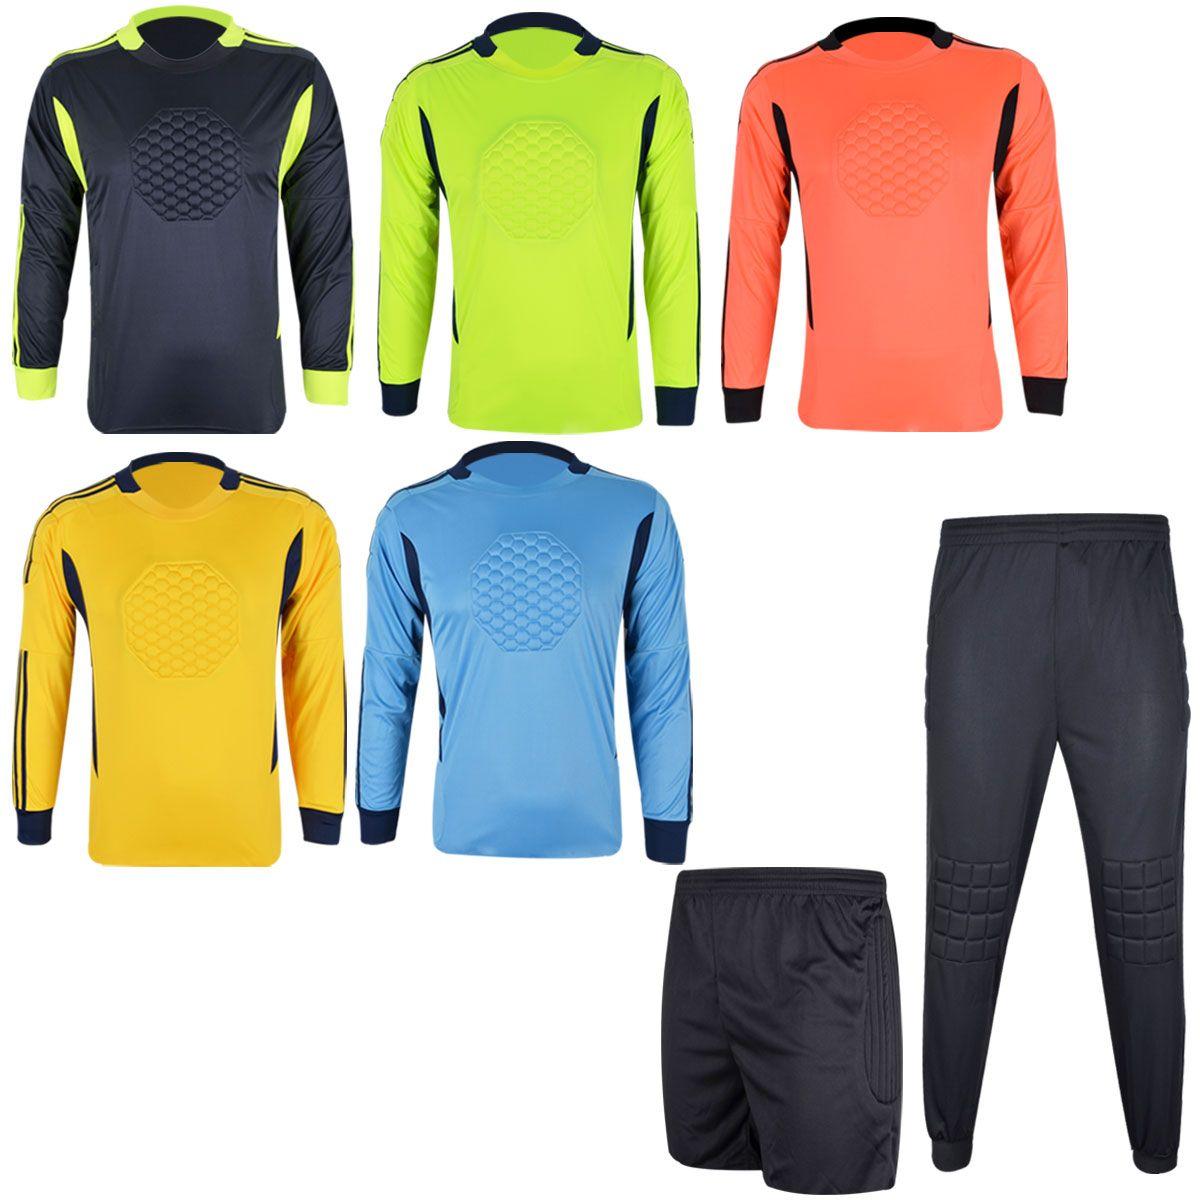 ea3e75da717 World Cup Doorkeepers adult child goalkeeper jersey goalkeeper clothing  lungmoon shirt soccer jersey Copa del Mundo US  22.74